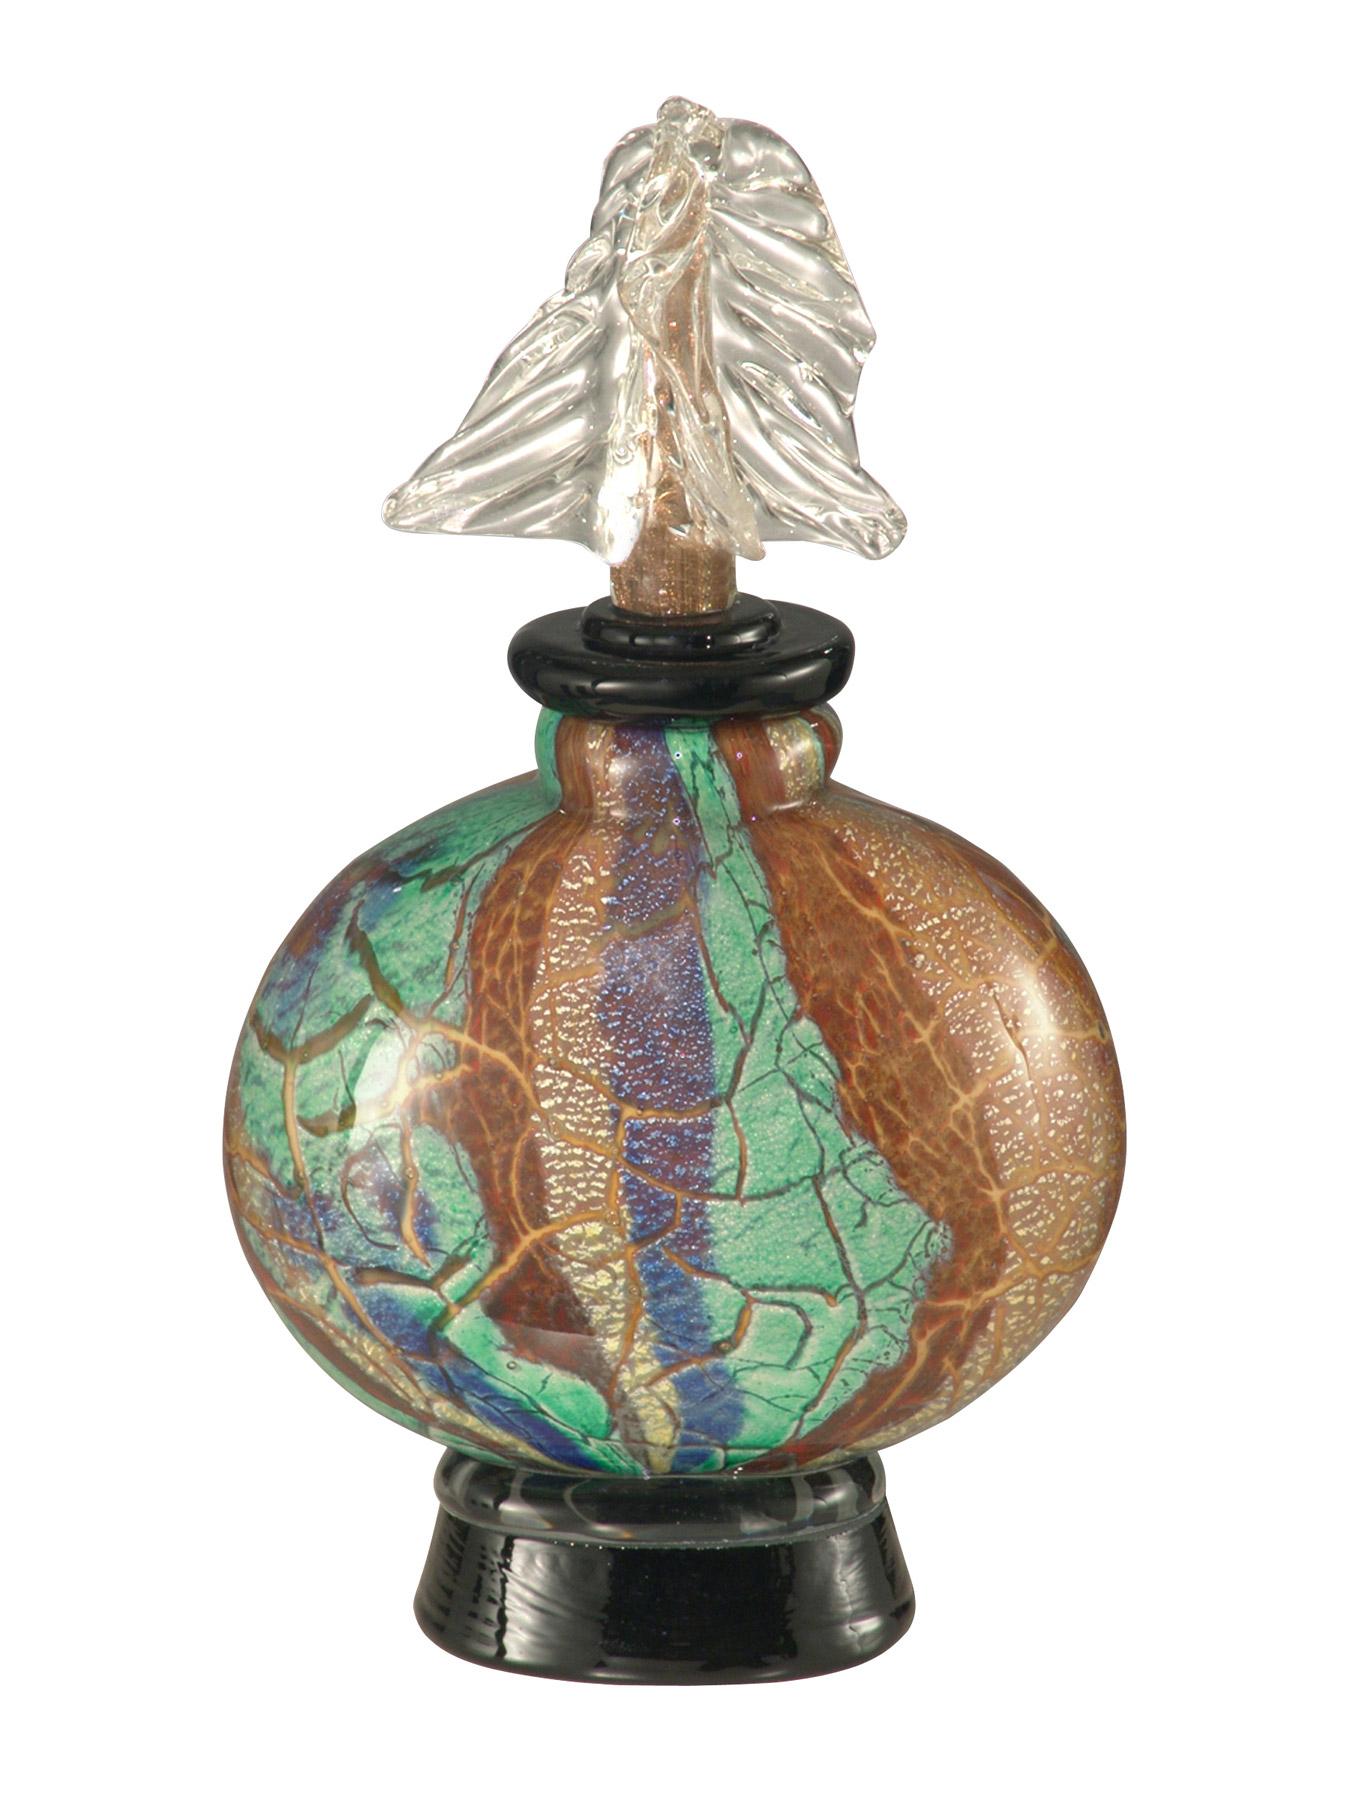 Dale Tiffany AV12083 Crackle Glass Decorative Perfume Bottle